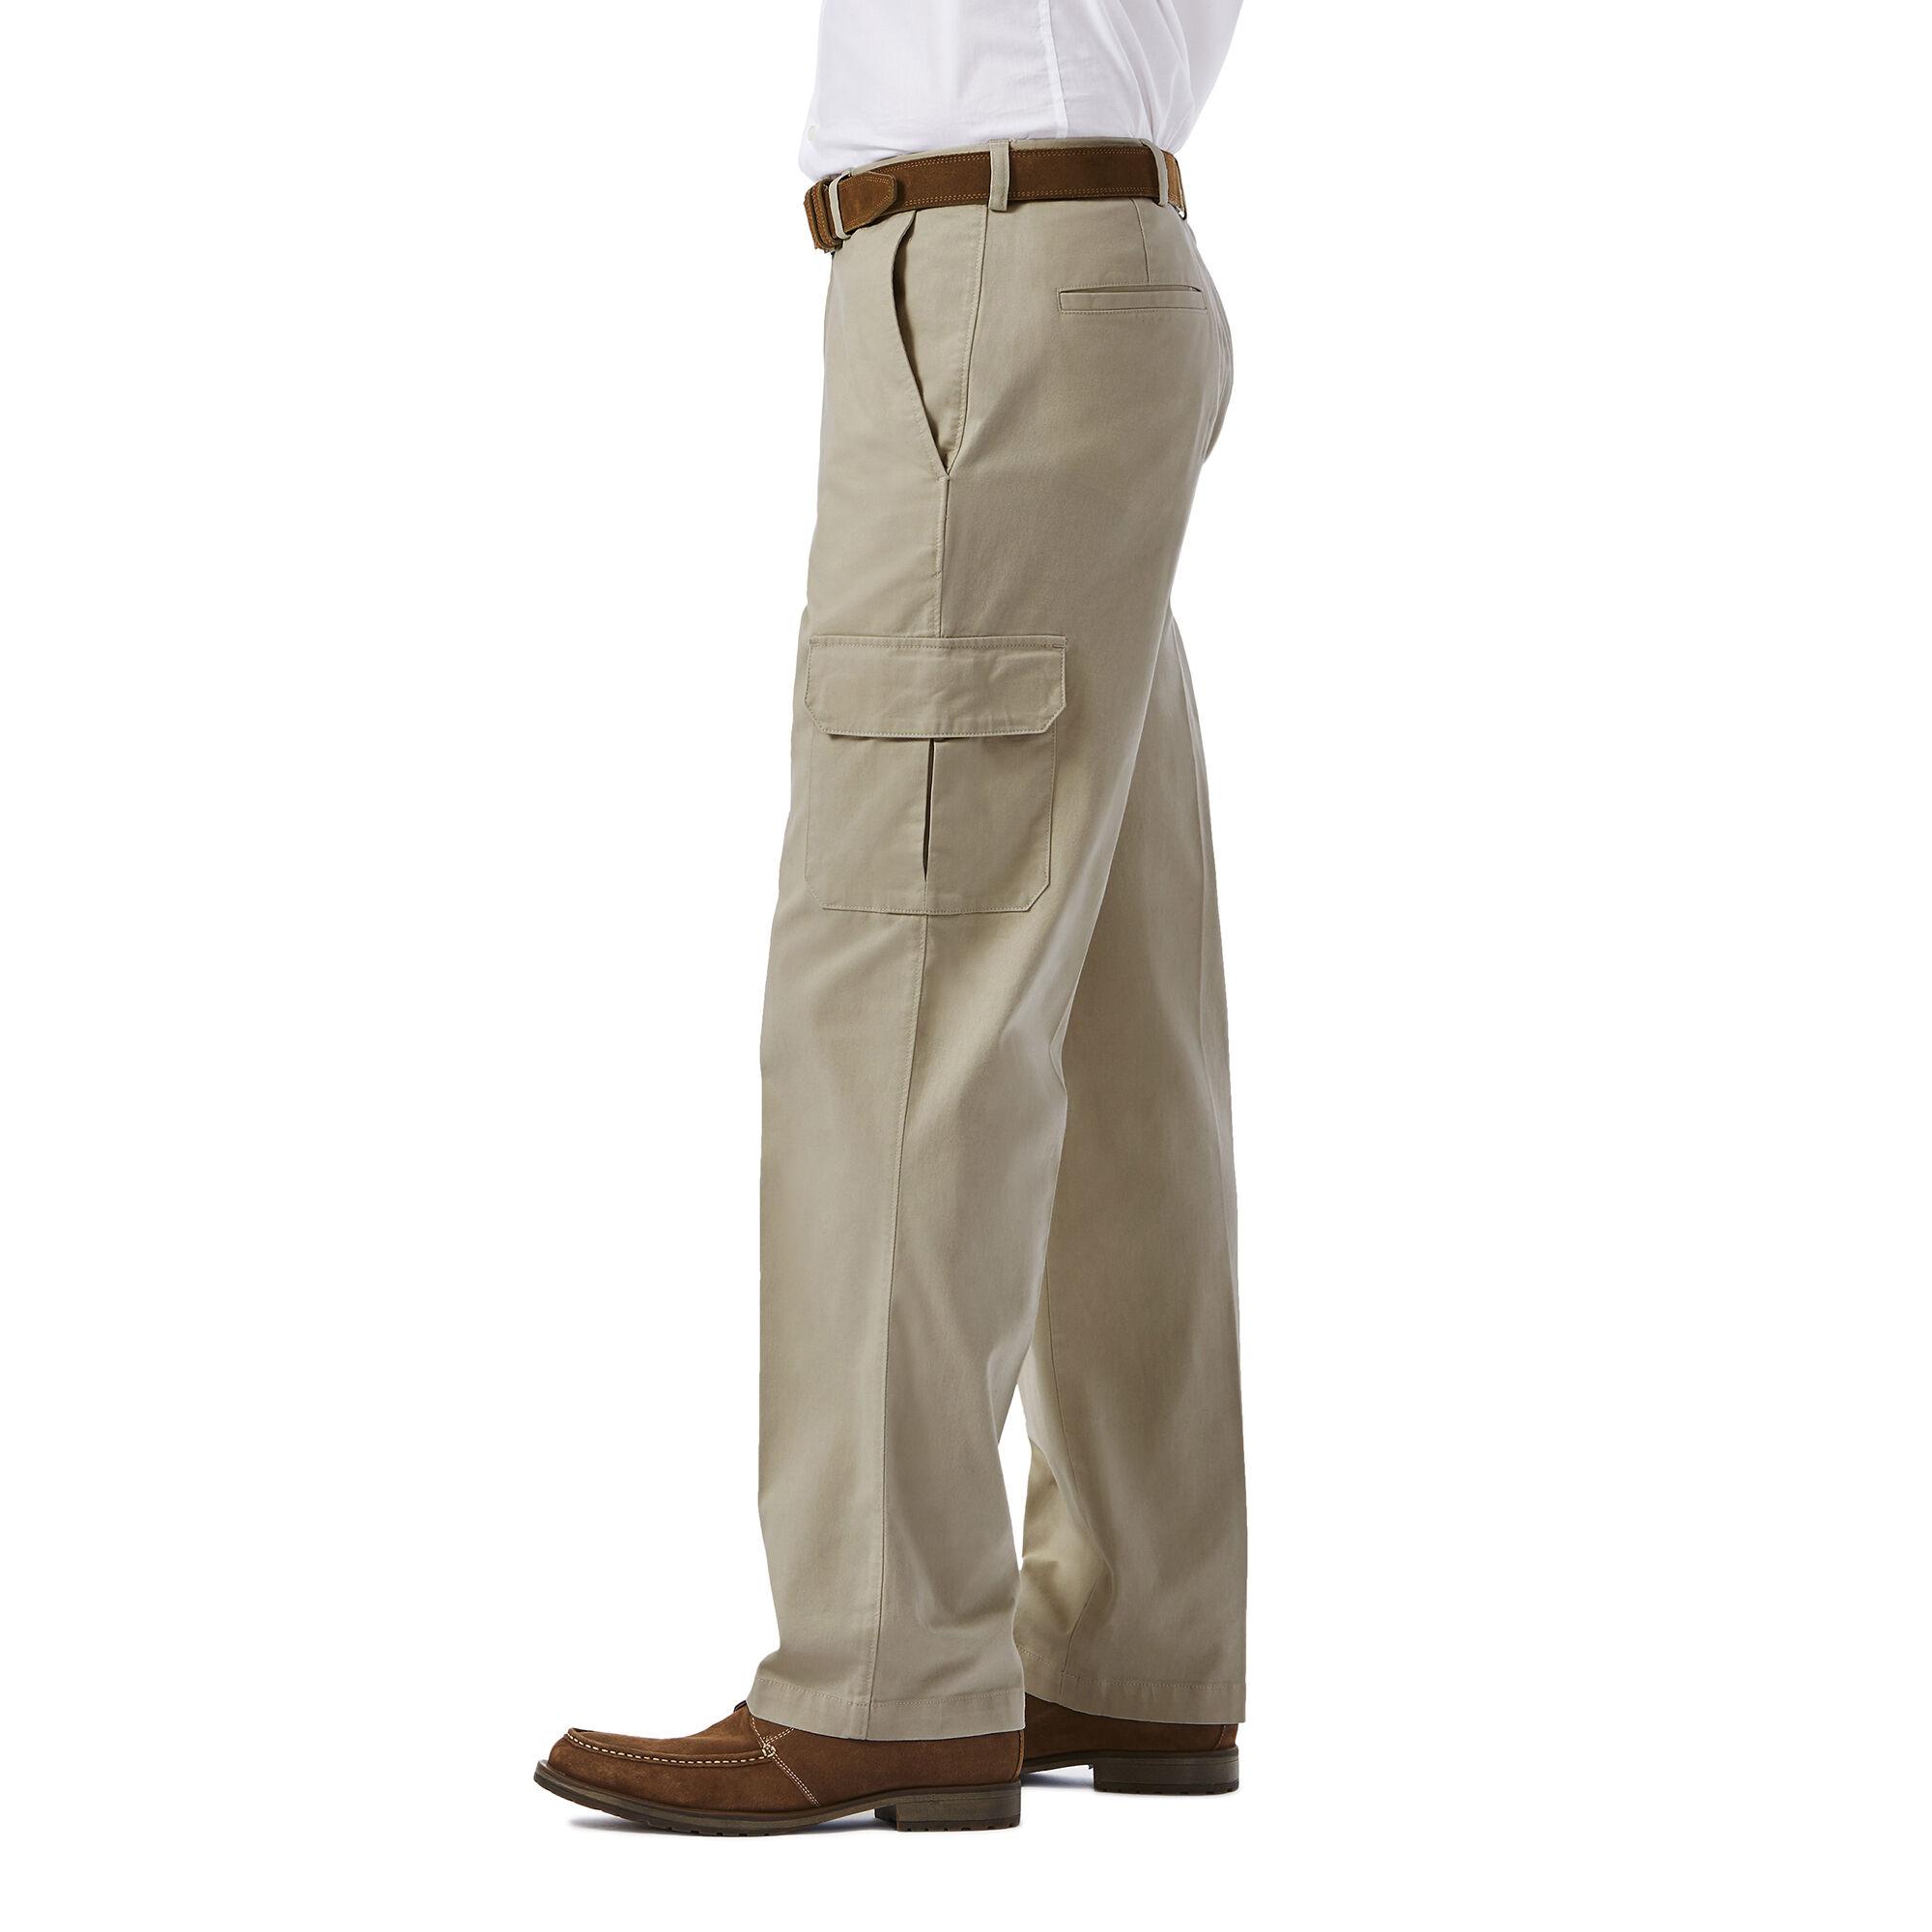 779c687adbe6 ... Stretch Comfort Cargo Pant